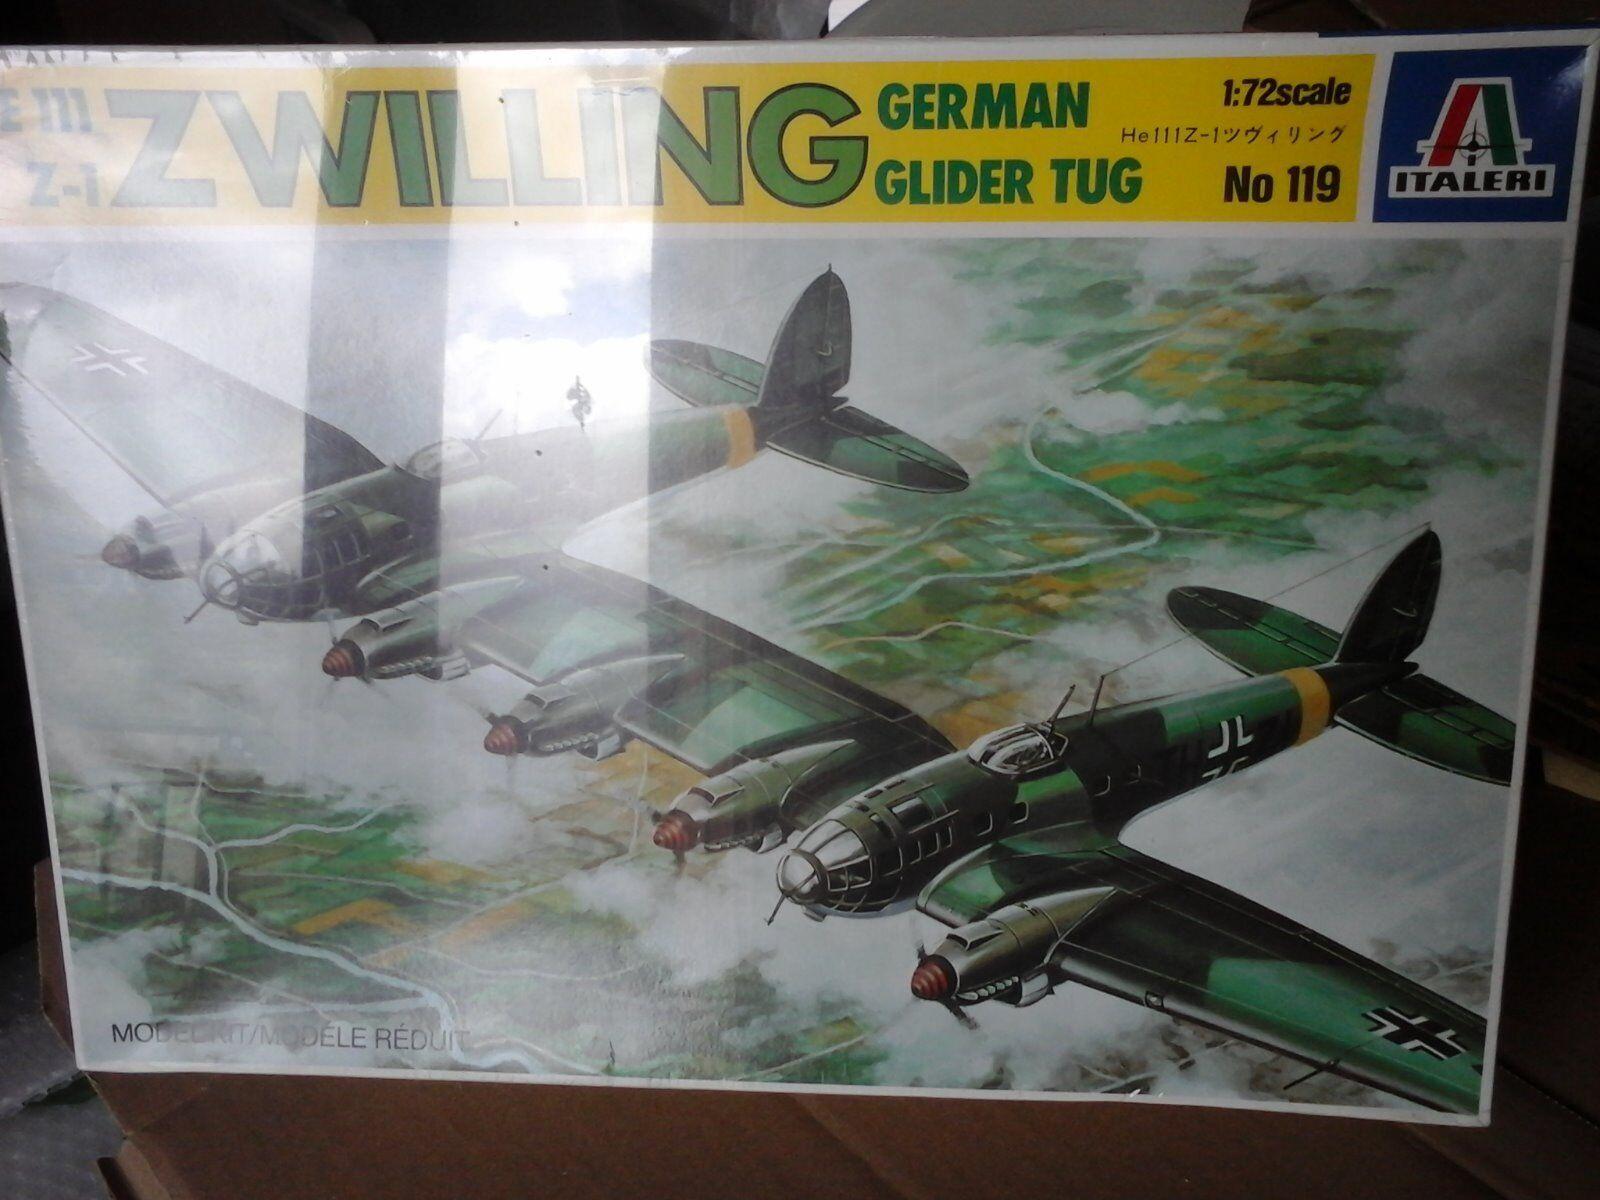 Heinkell he111 Zwilling German Glider Tug 1 72 scale Italeri Model